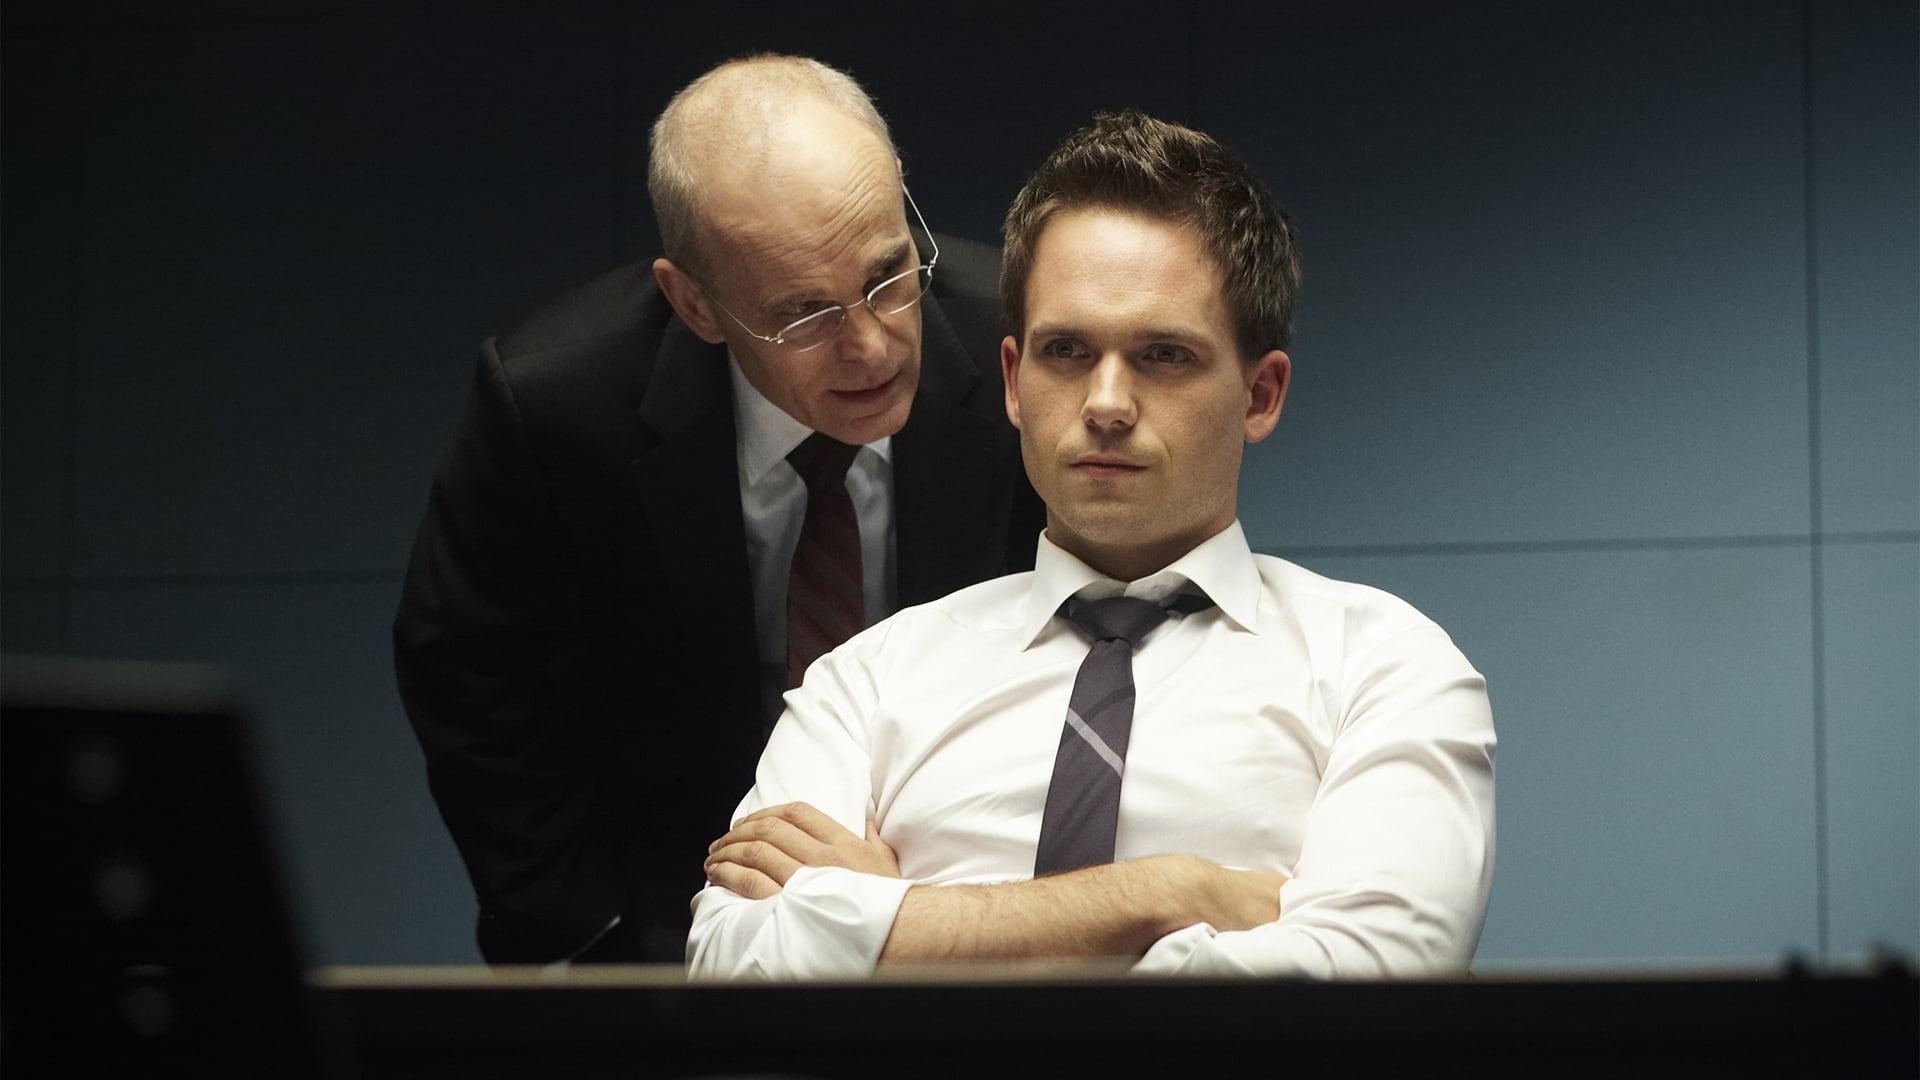 Suits - Season 3 Episode 16 : No Way Out